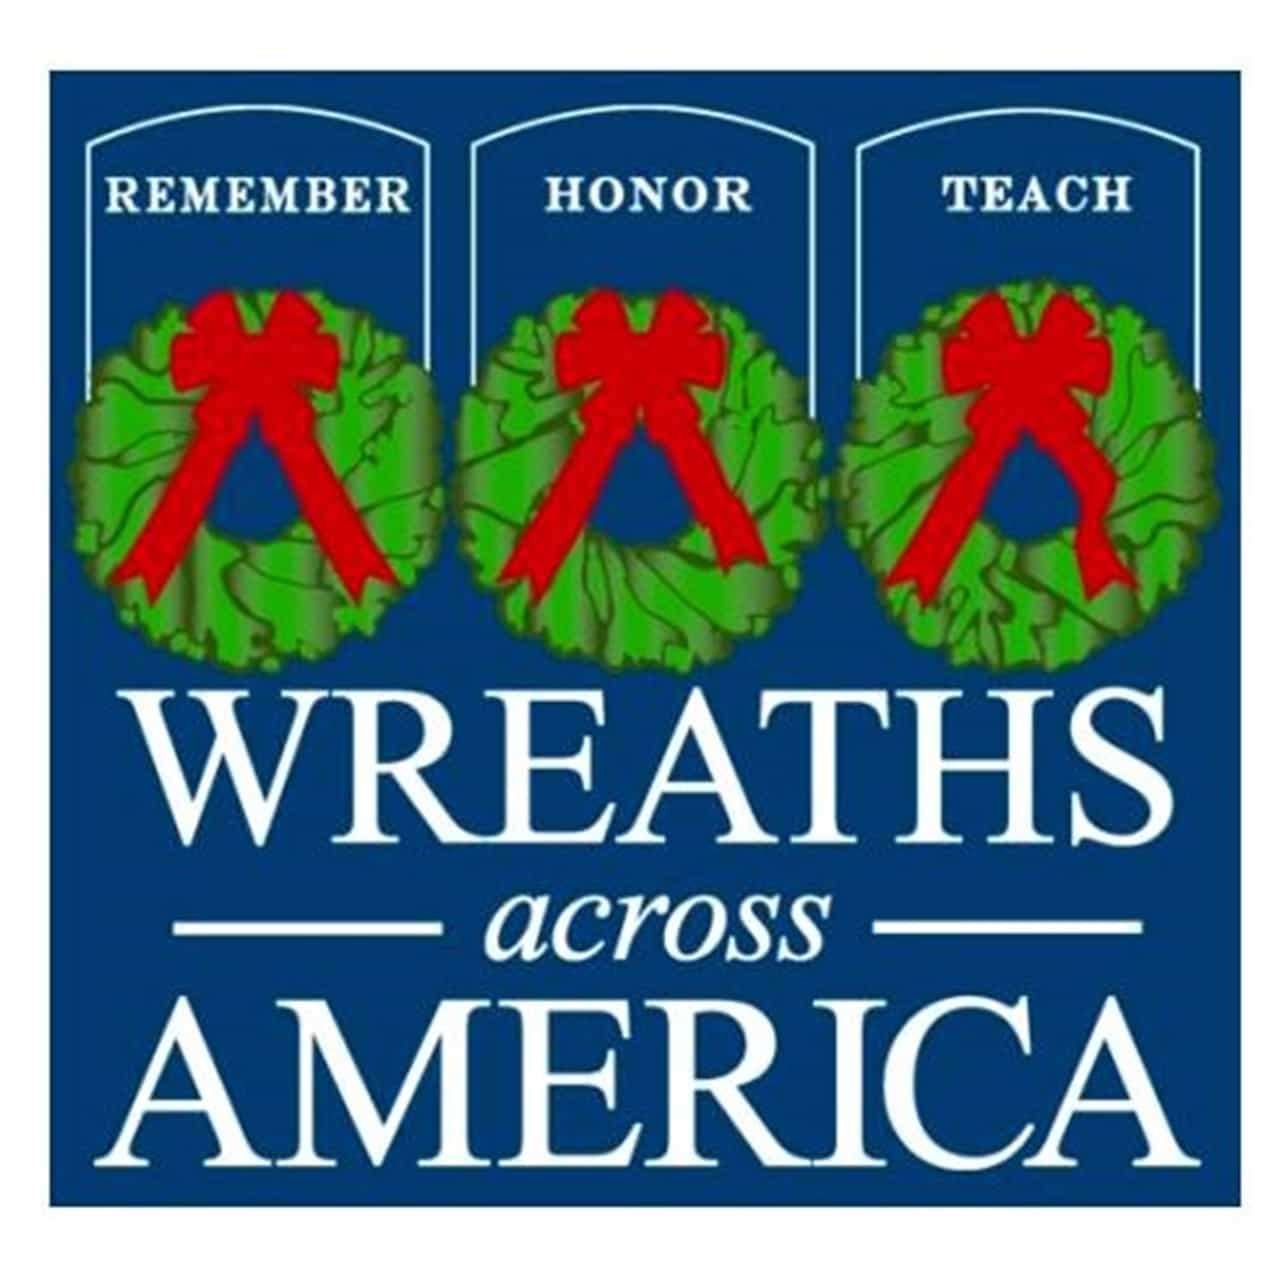 Christmas in July — Wreaths Across America